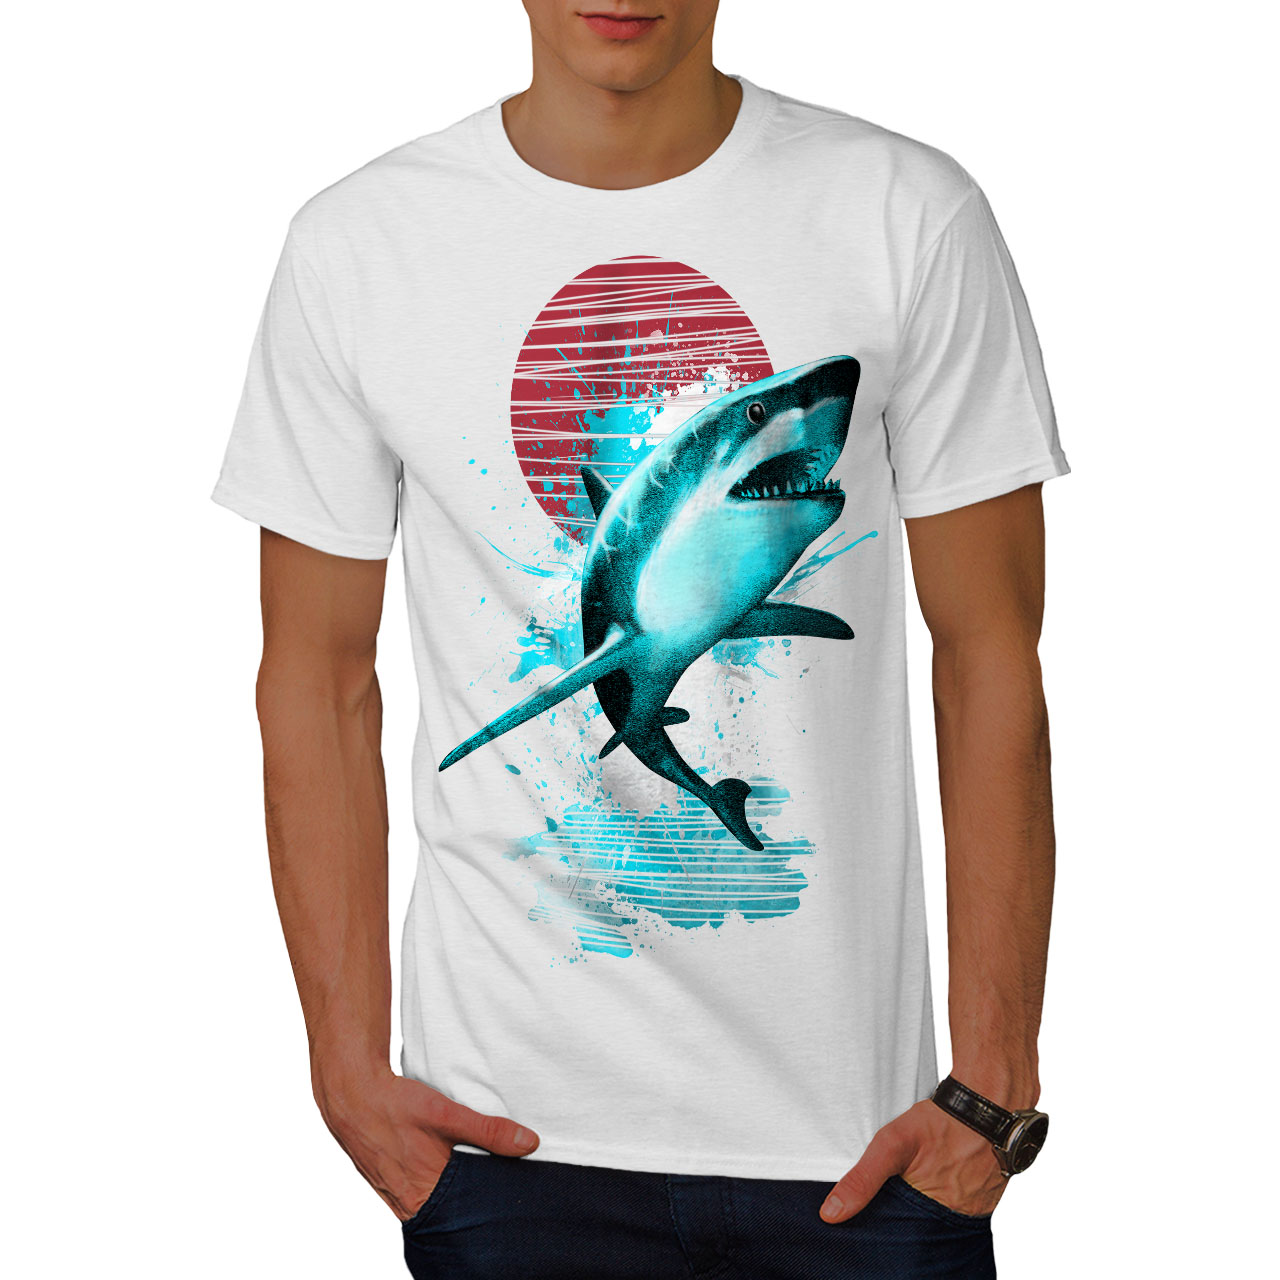 Oceano Hunt design grafico stampato T-shirt Wellcoda Grande Squalo Bianco Da Uomo T-shirt